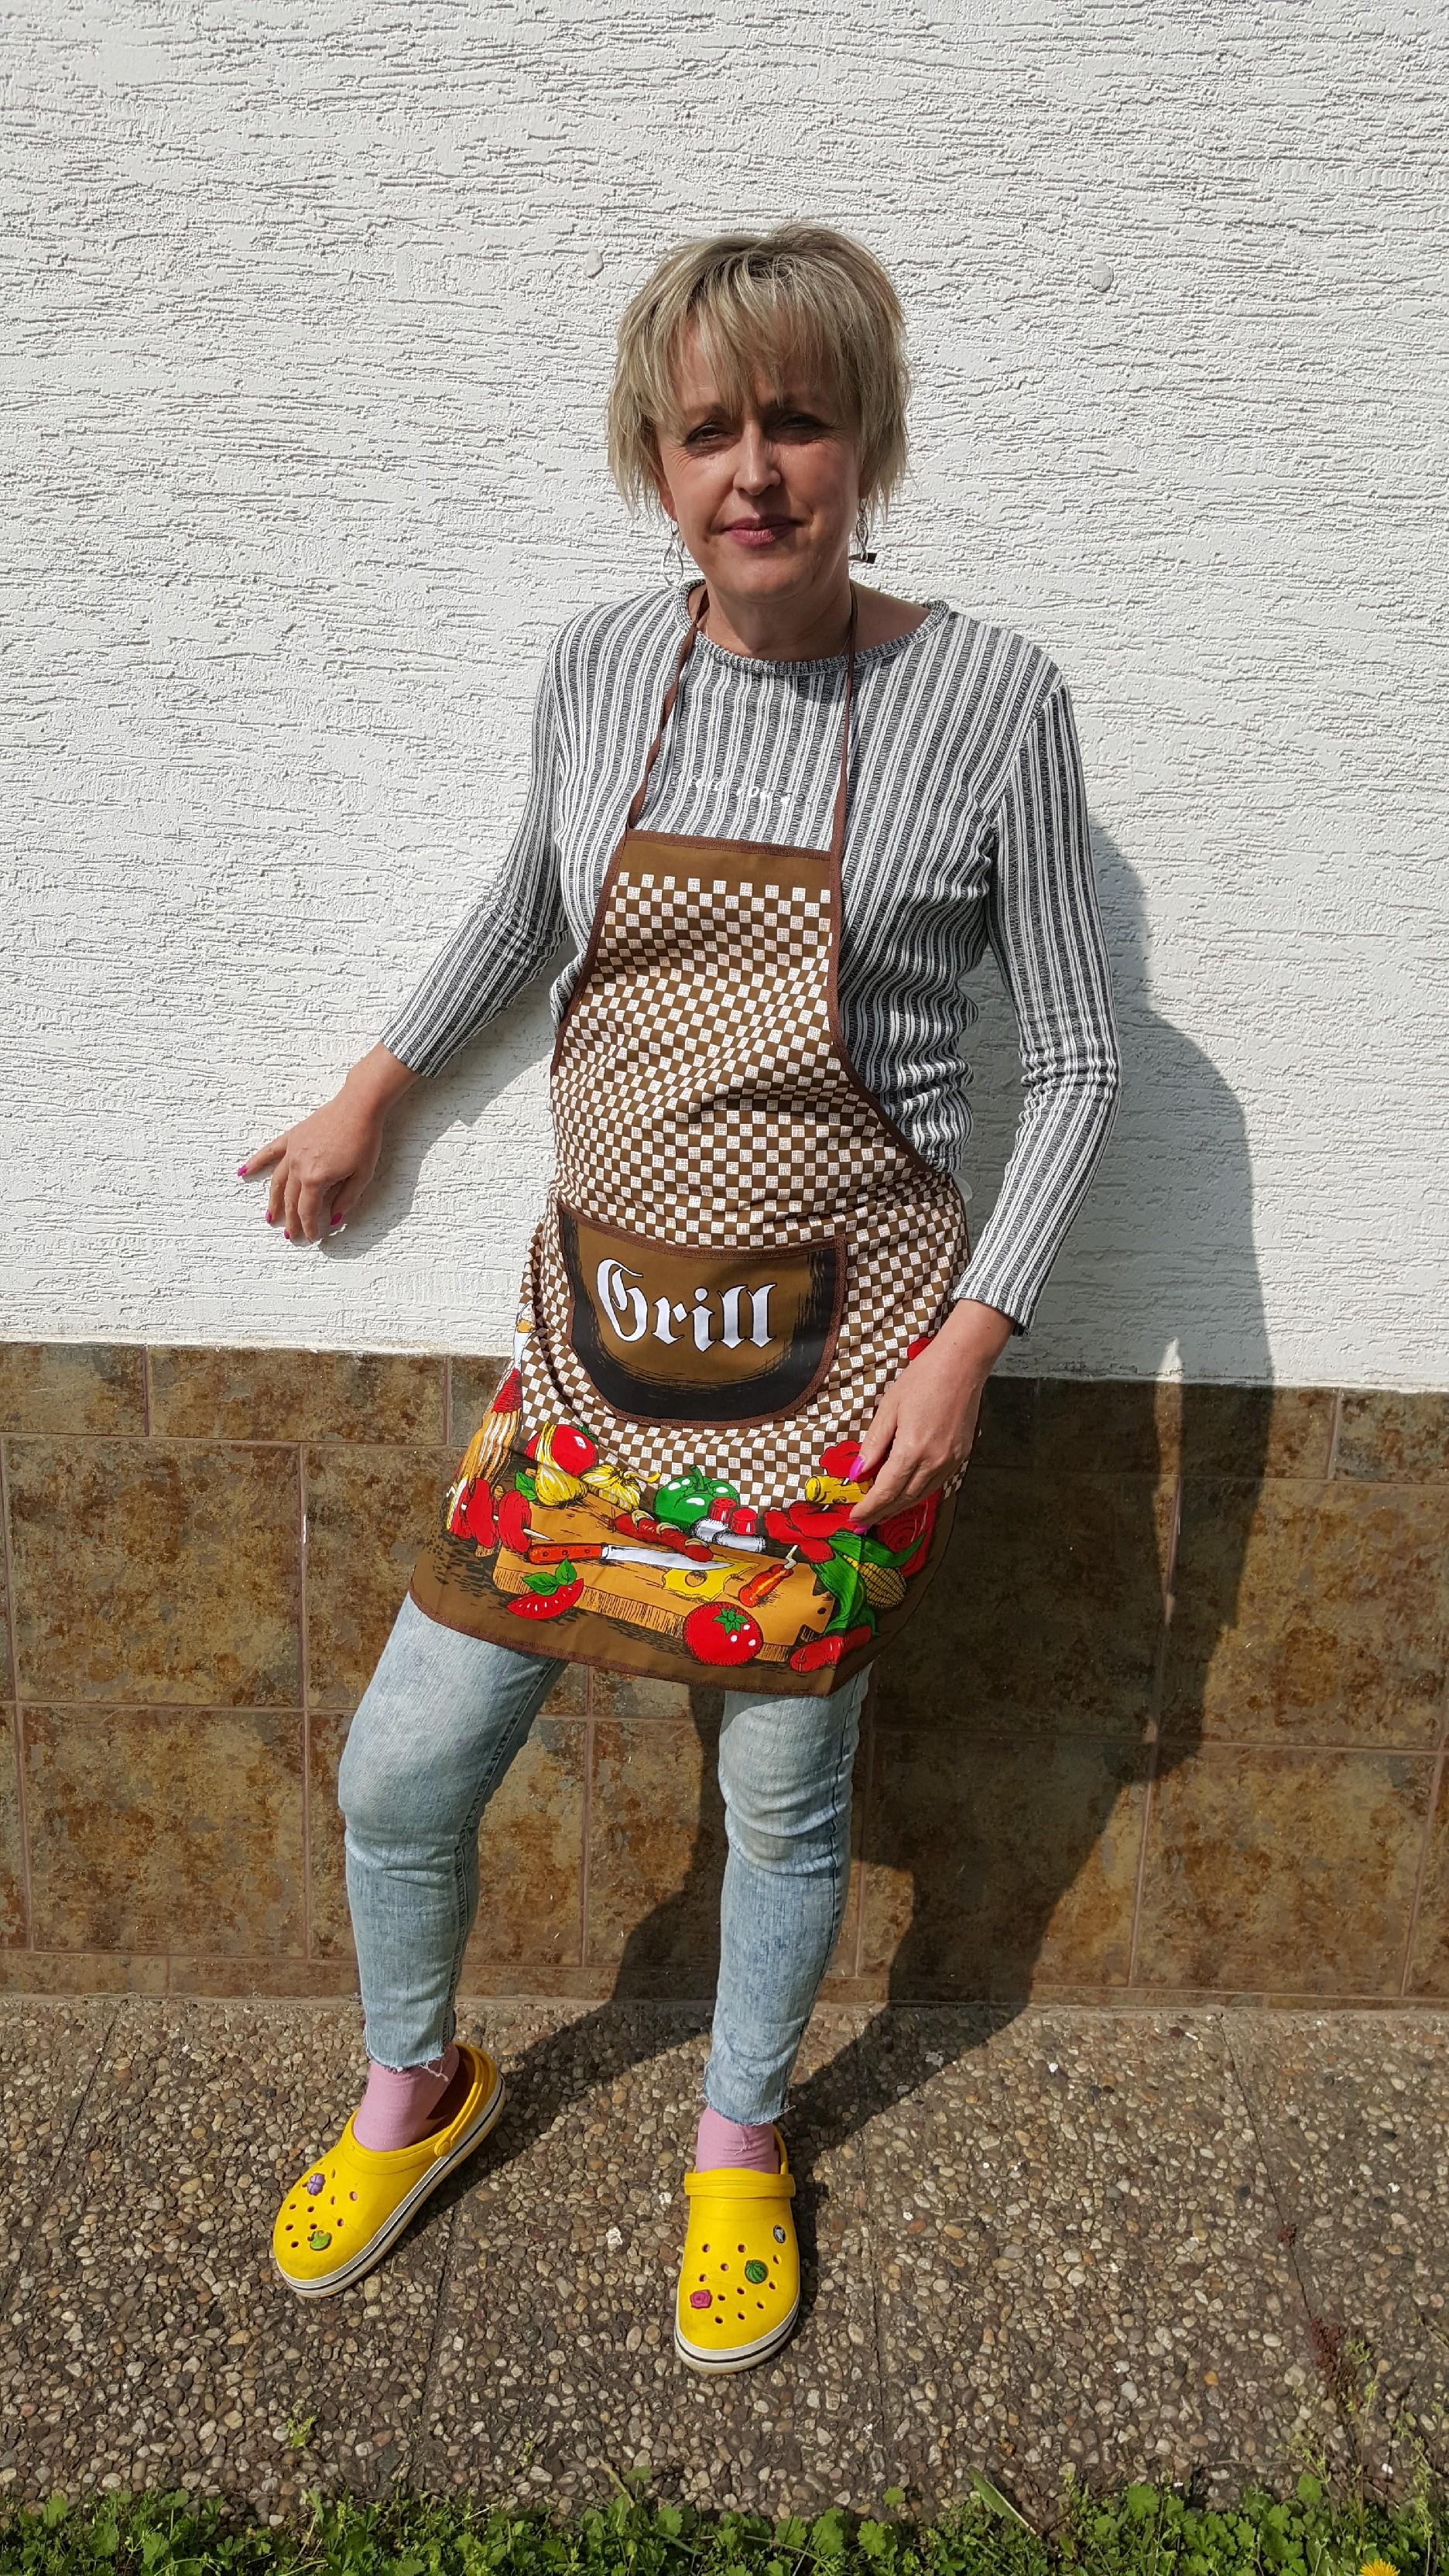 SKANTEX Kuchyňská zástěra - GRILL